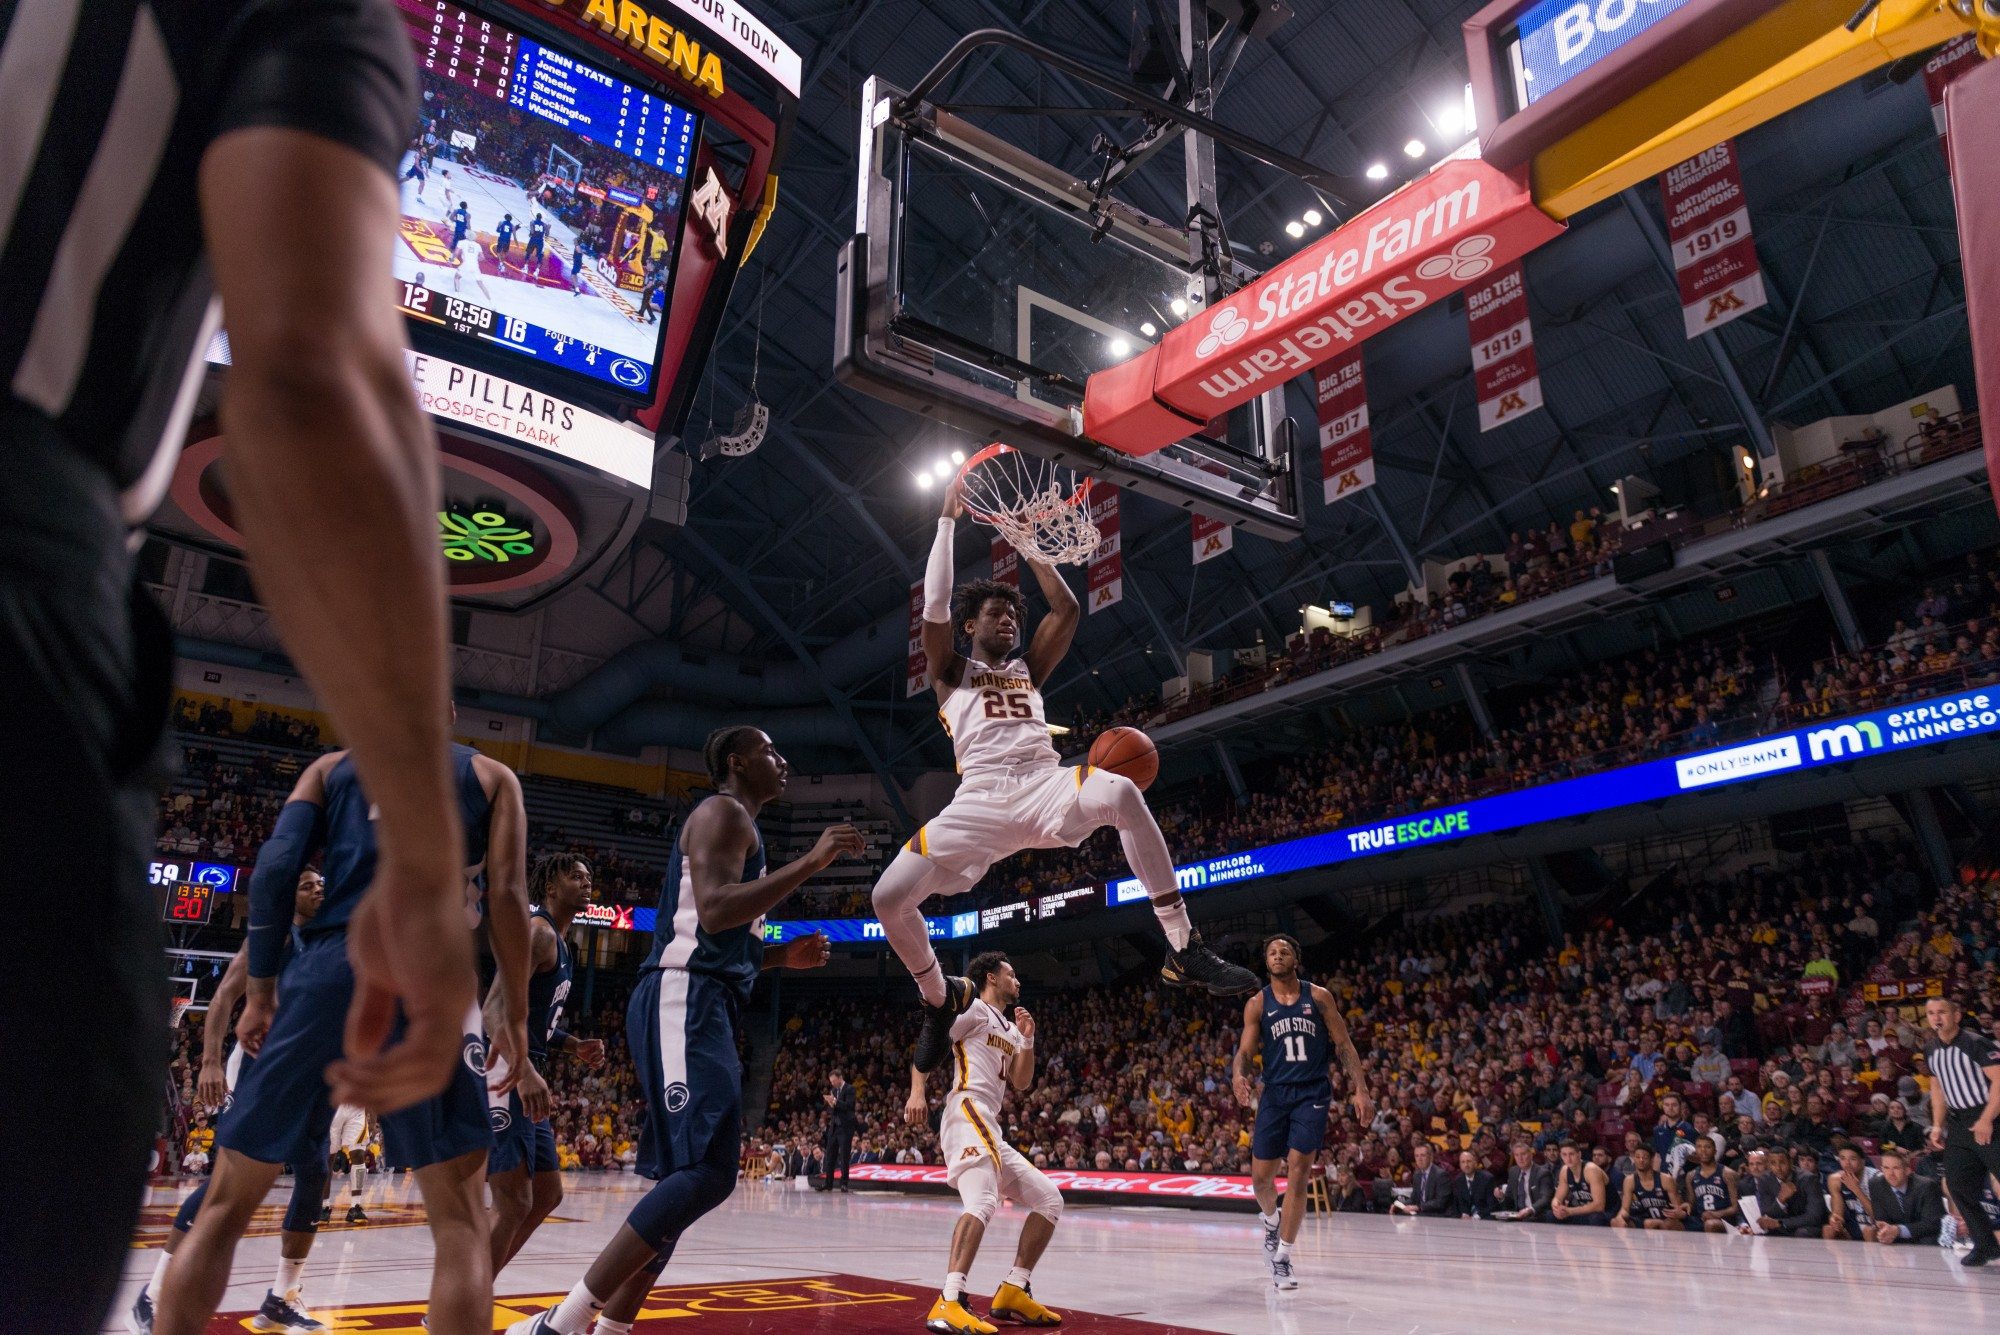 Gophers Center Daniel Oturu dunks the ball at Williams Arena on Wednesday, Jan. 15.  Minnesota defeated the Penn State Nittany Lions 75-69. (Kamaan Richards / Minnesota Daily)